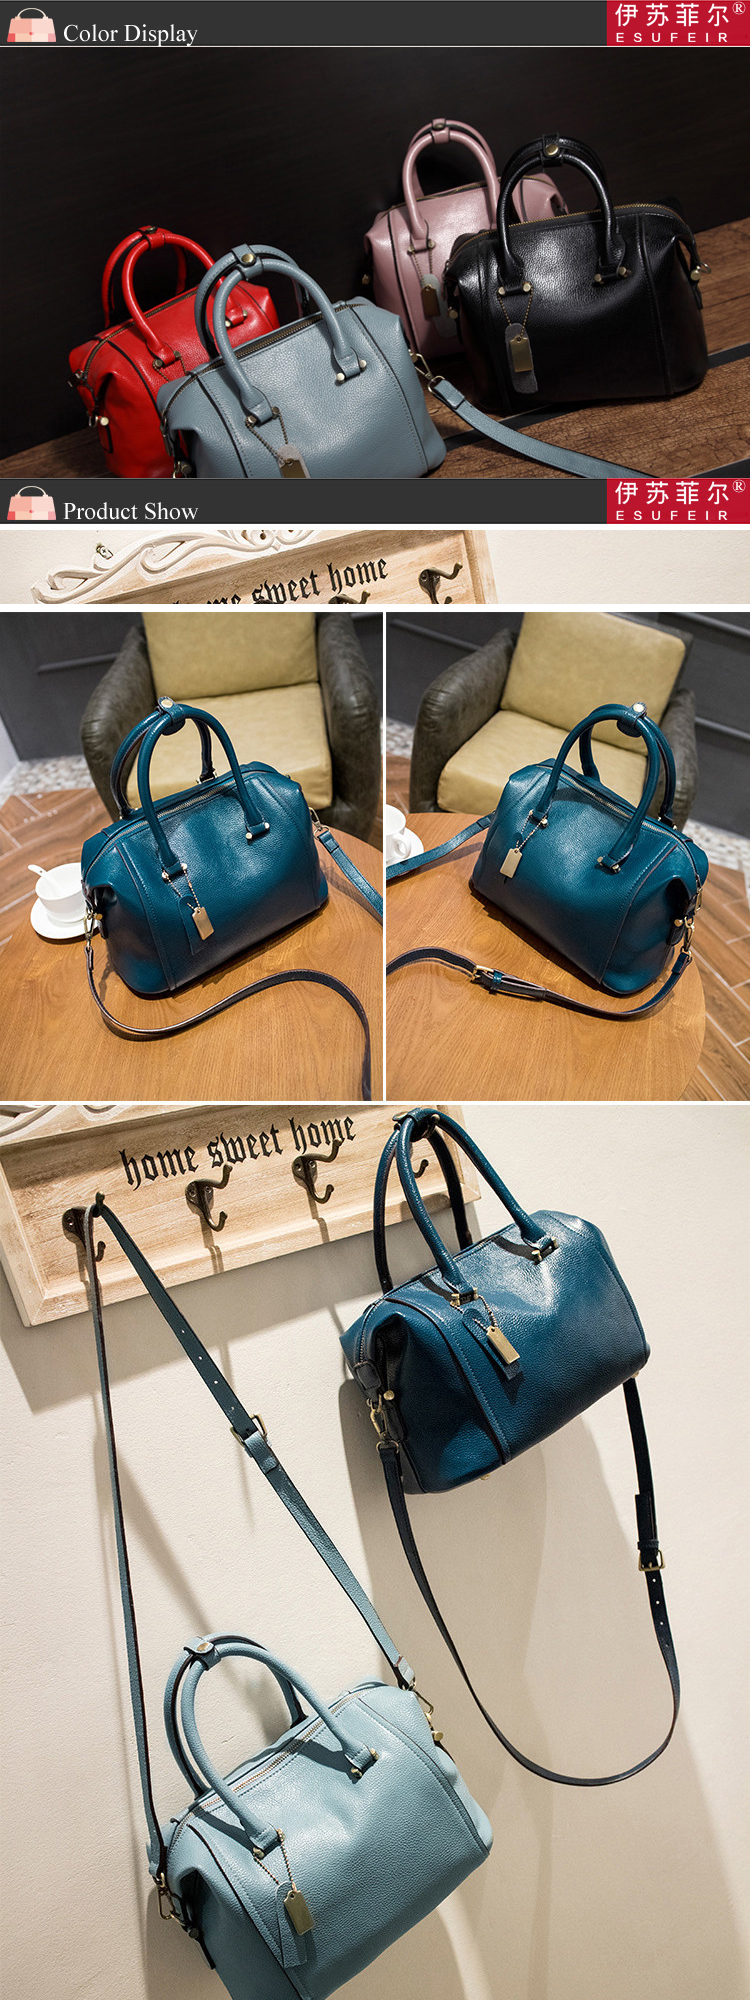 women-handbag10.0